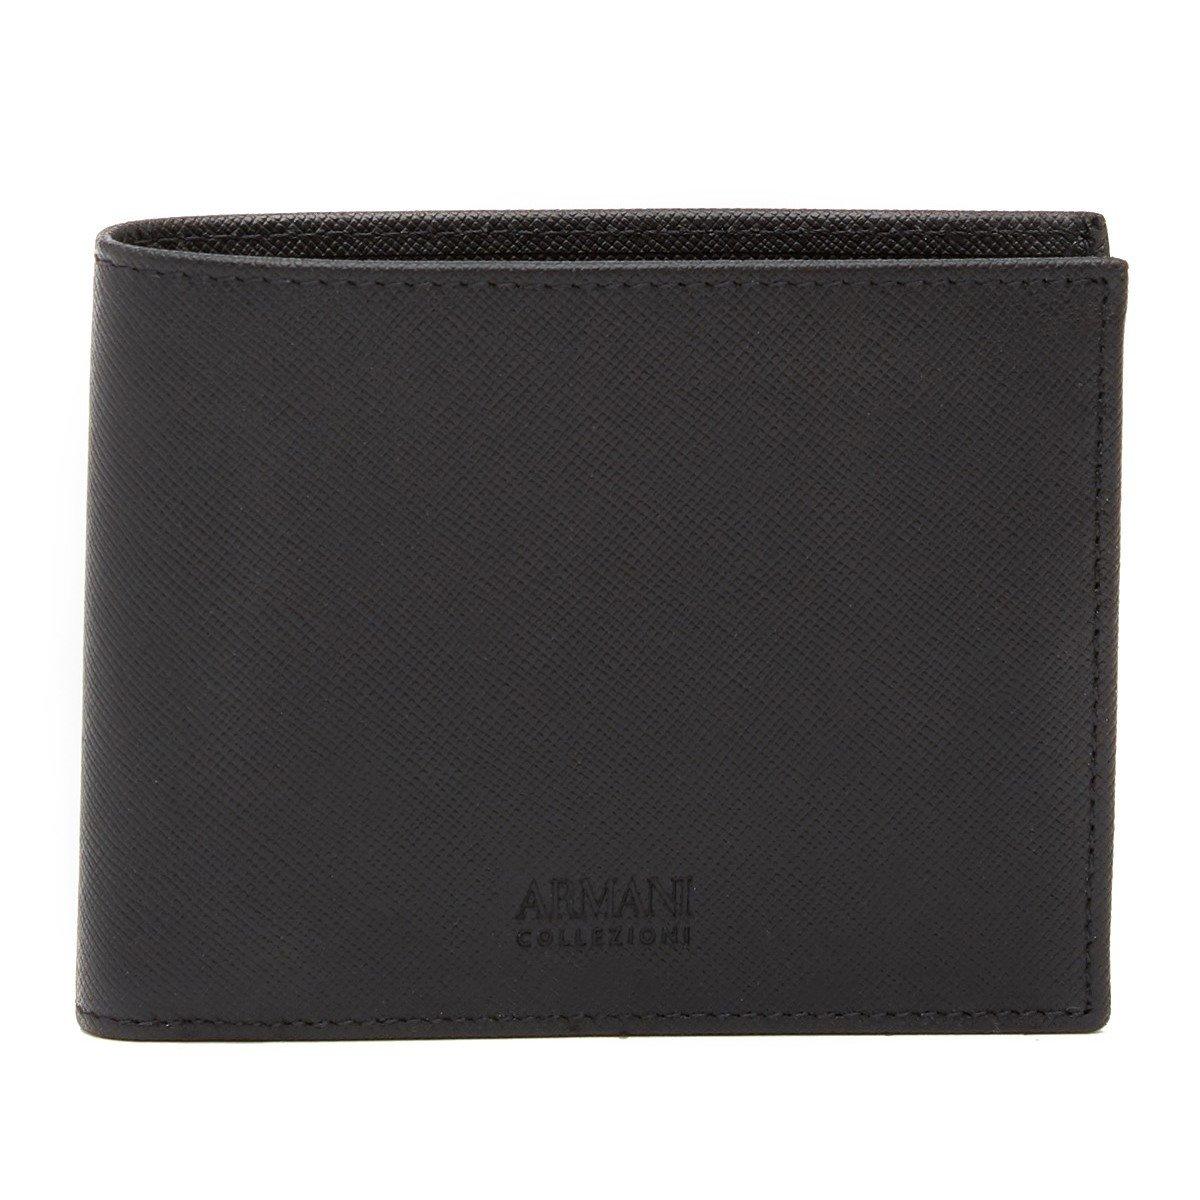 Armani Collezioni ACCESSORY メンズ US サイズ: One Size カラー: ブラック B07D6YTPC8